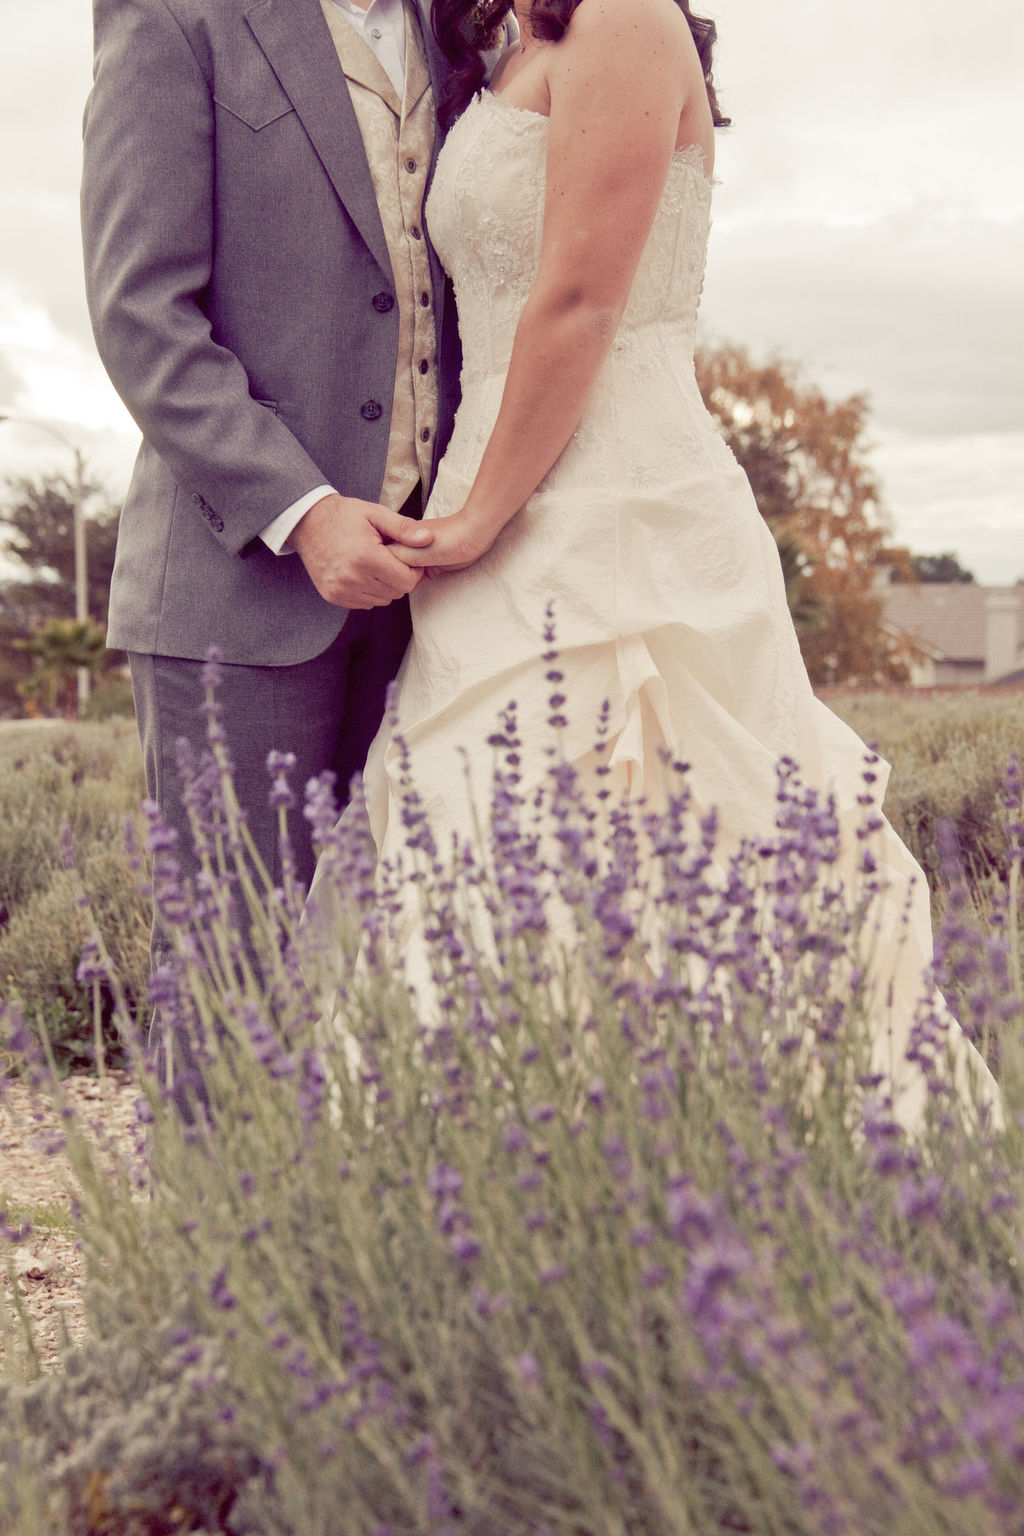 Jack rabbit ranch wedding